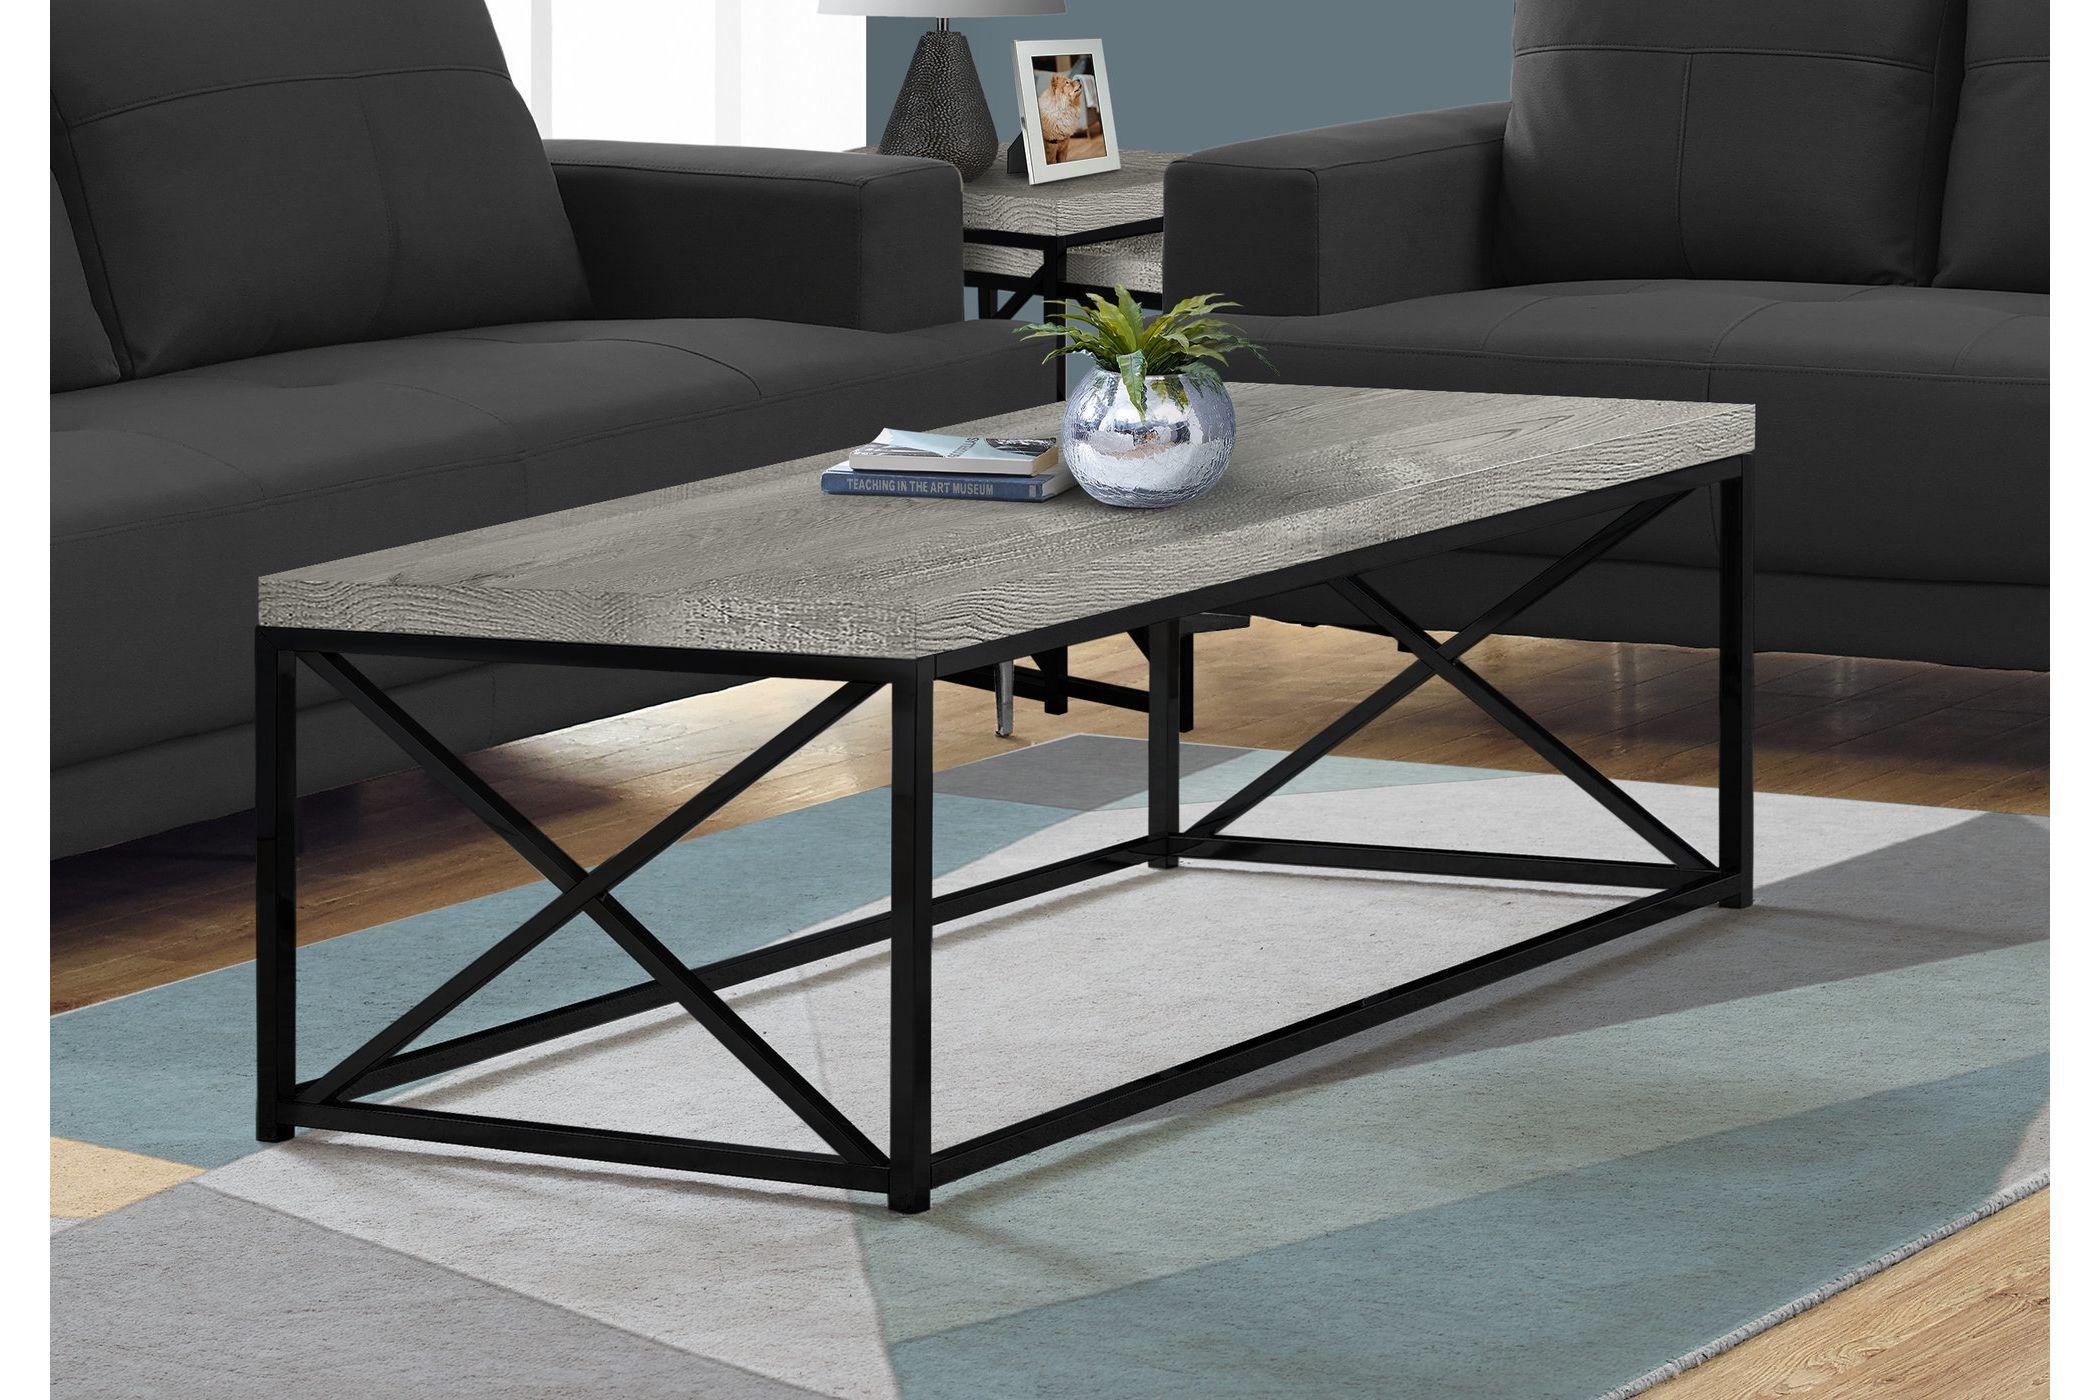 Grey Reclaimed Wood Coffee Table At Gardner White Coffee Table Coffee Table Wood Living Room Coffee Table [ 1400 x 2100 Pixel ]